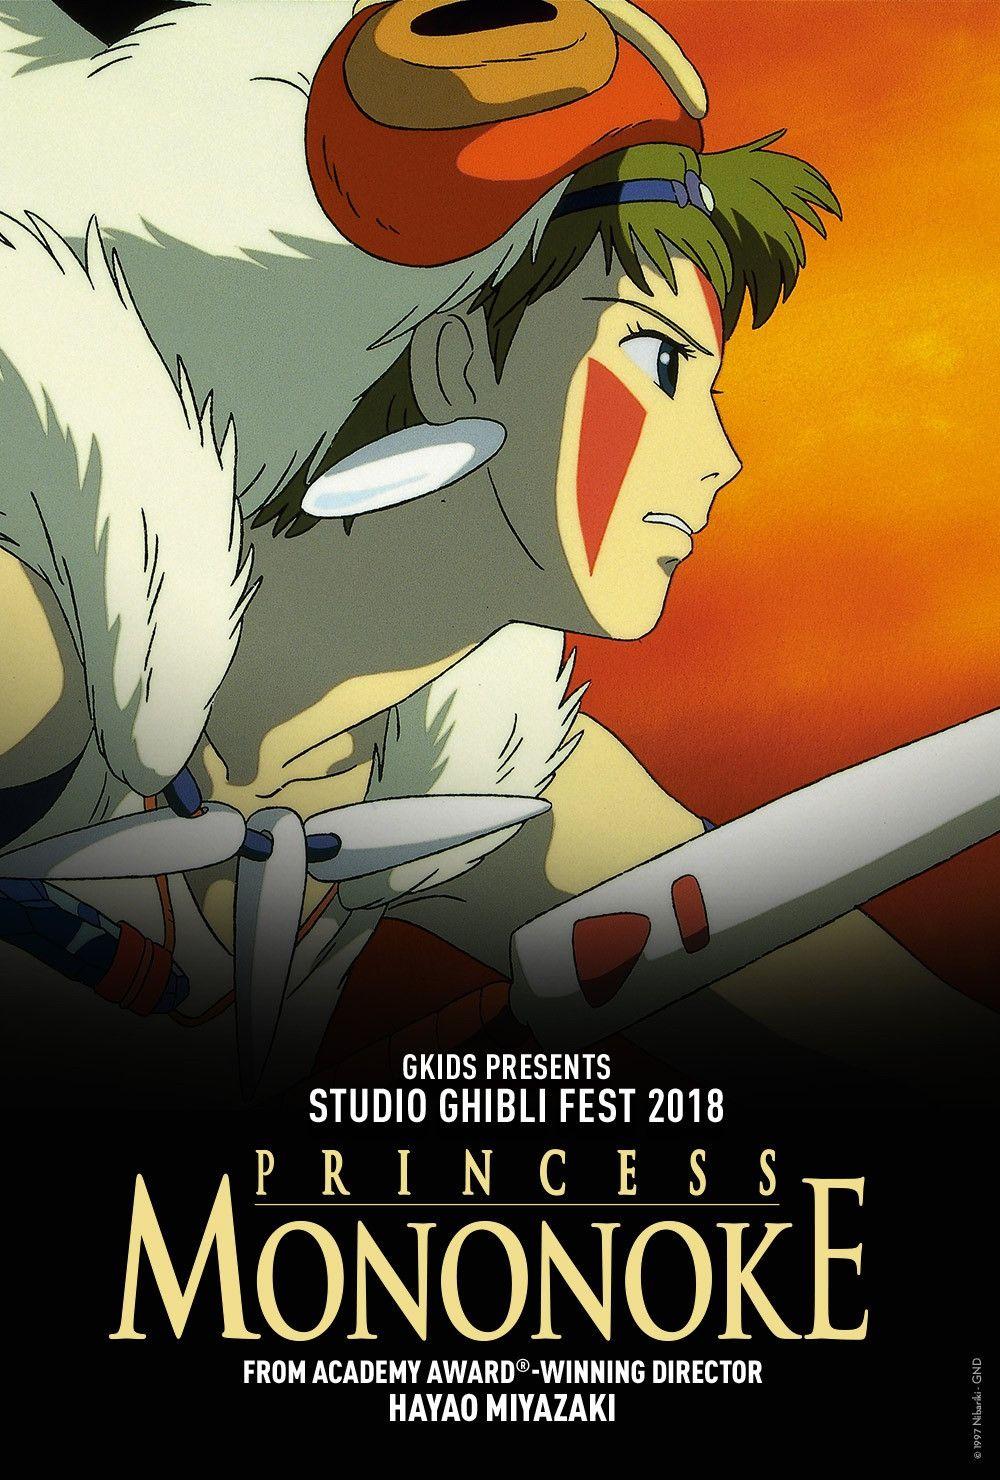 upcoming anime anime events harmony anime